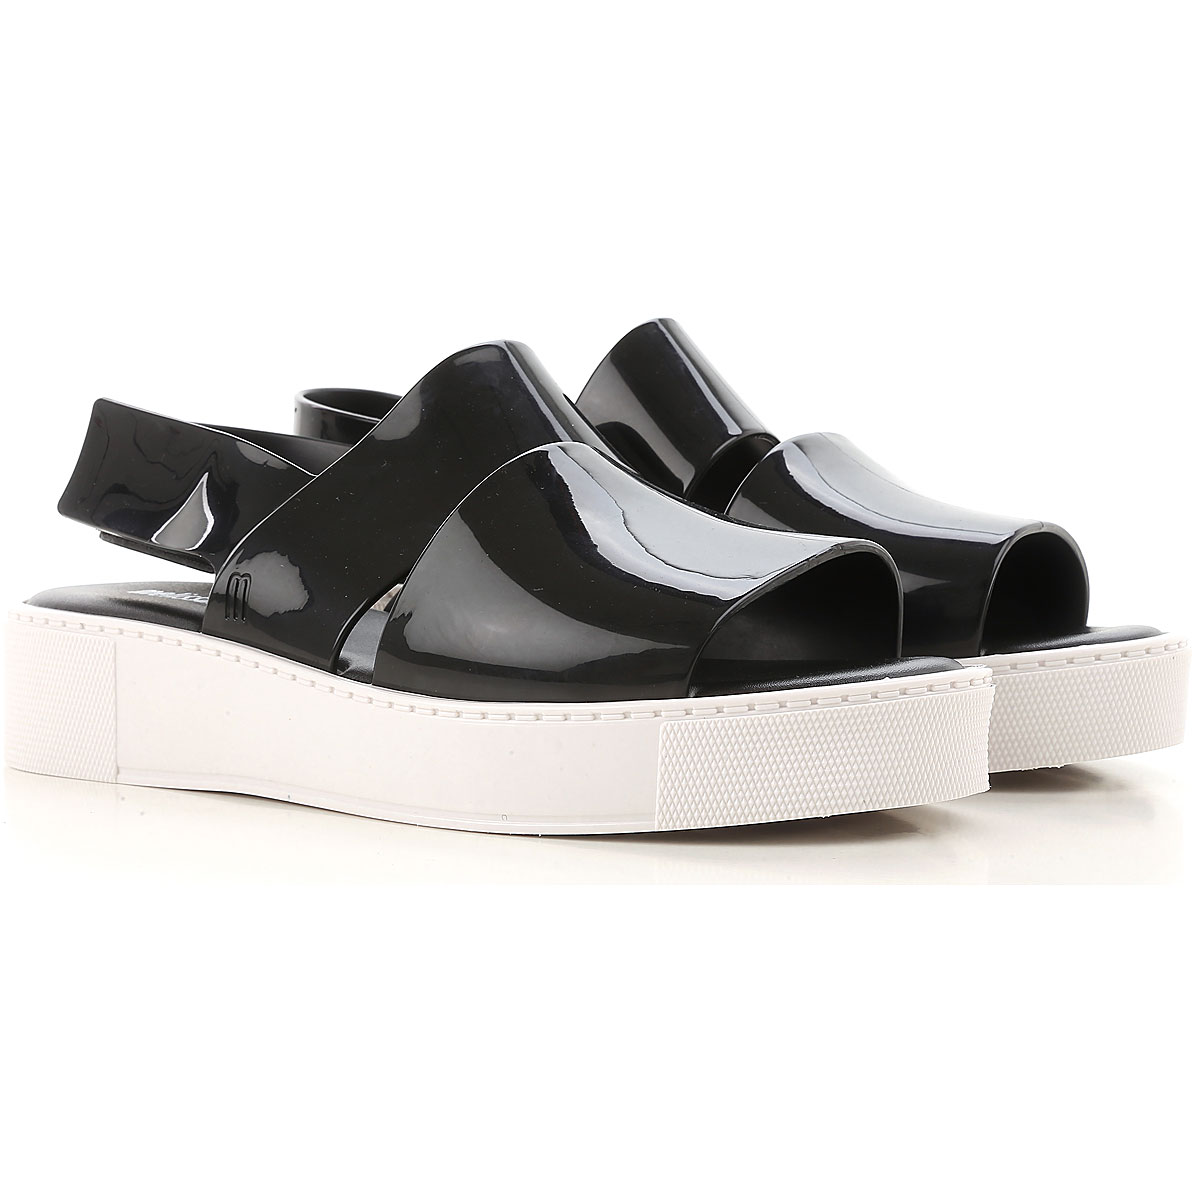 Melissa Sandals for Women On Sale in Outlet, Black, plastic, 2019, USA 6 - EUR 37 USA 9 - EUR 40